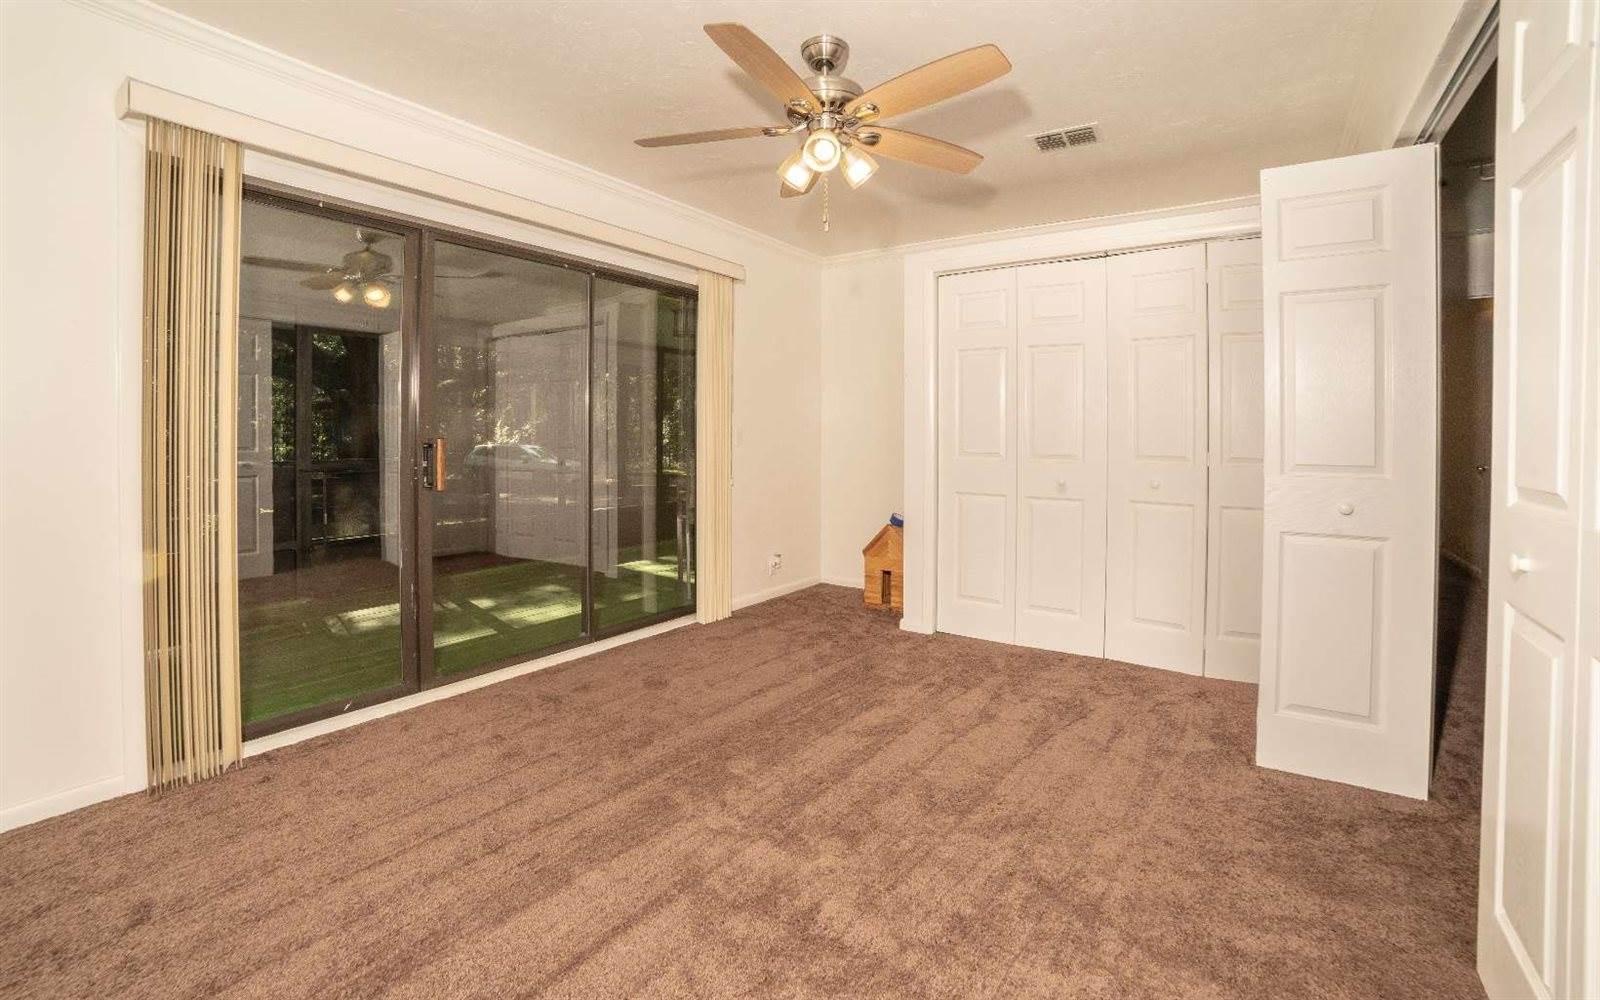 12595 158th Terrace, McAlpin, FL 32062